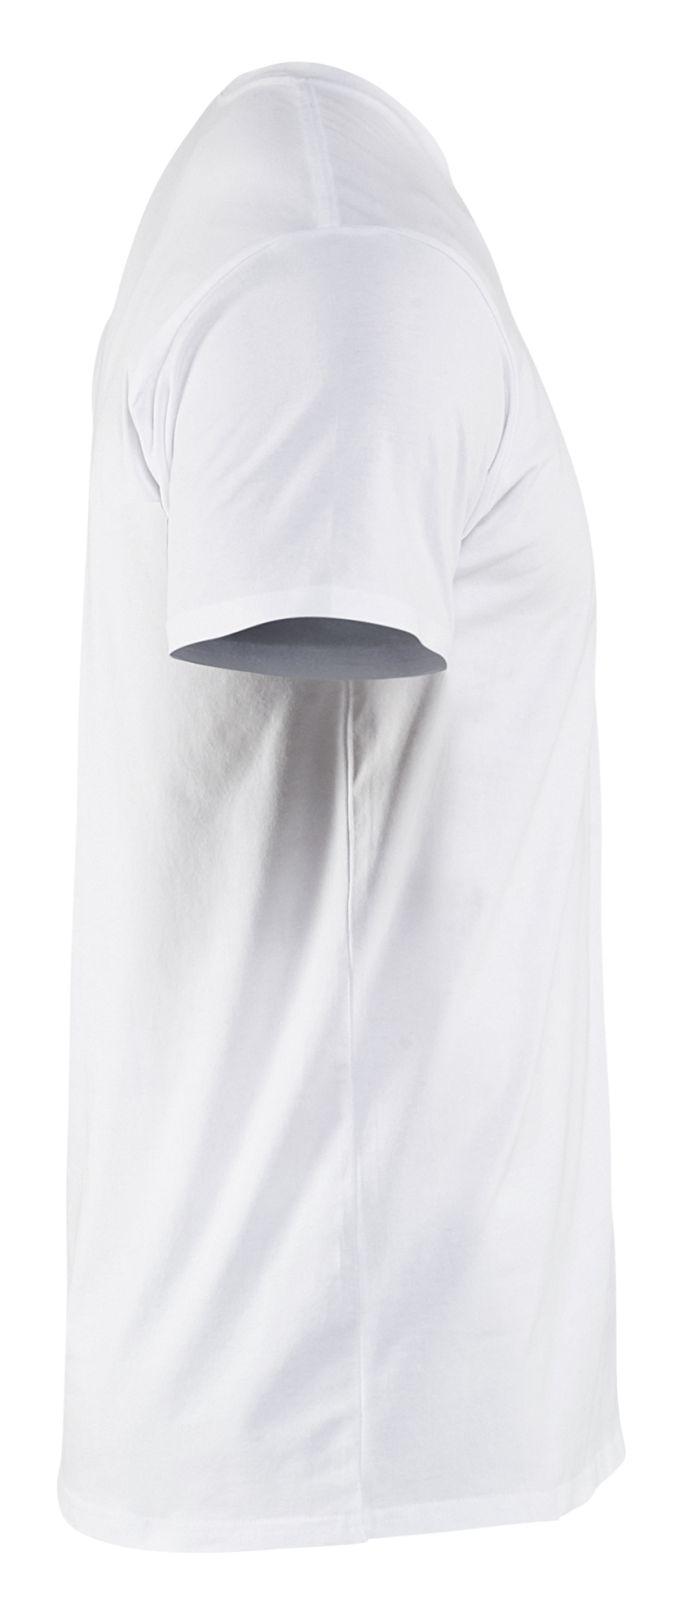 Blaklader T-shirts 33331029 2-pack wit(1000)